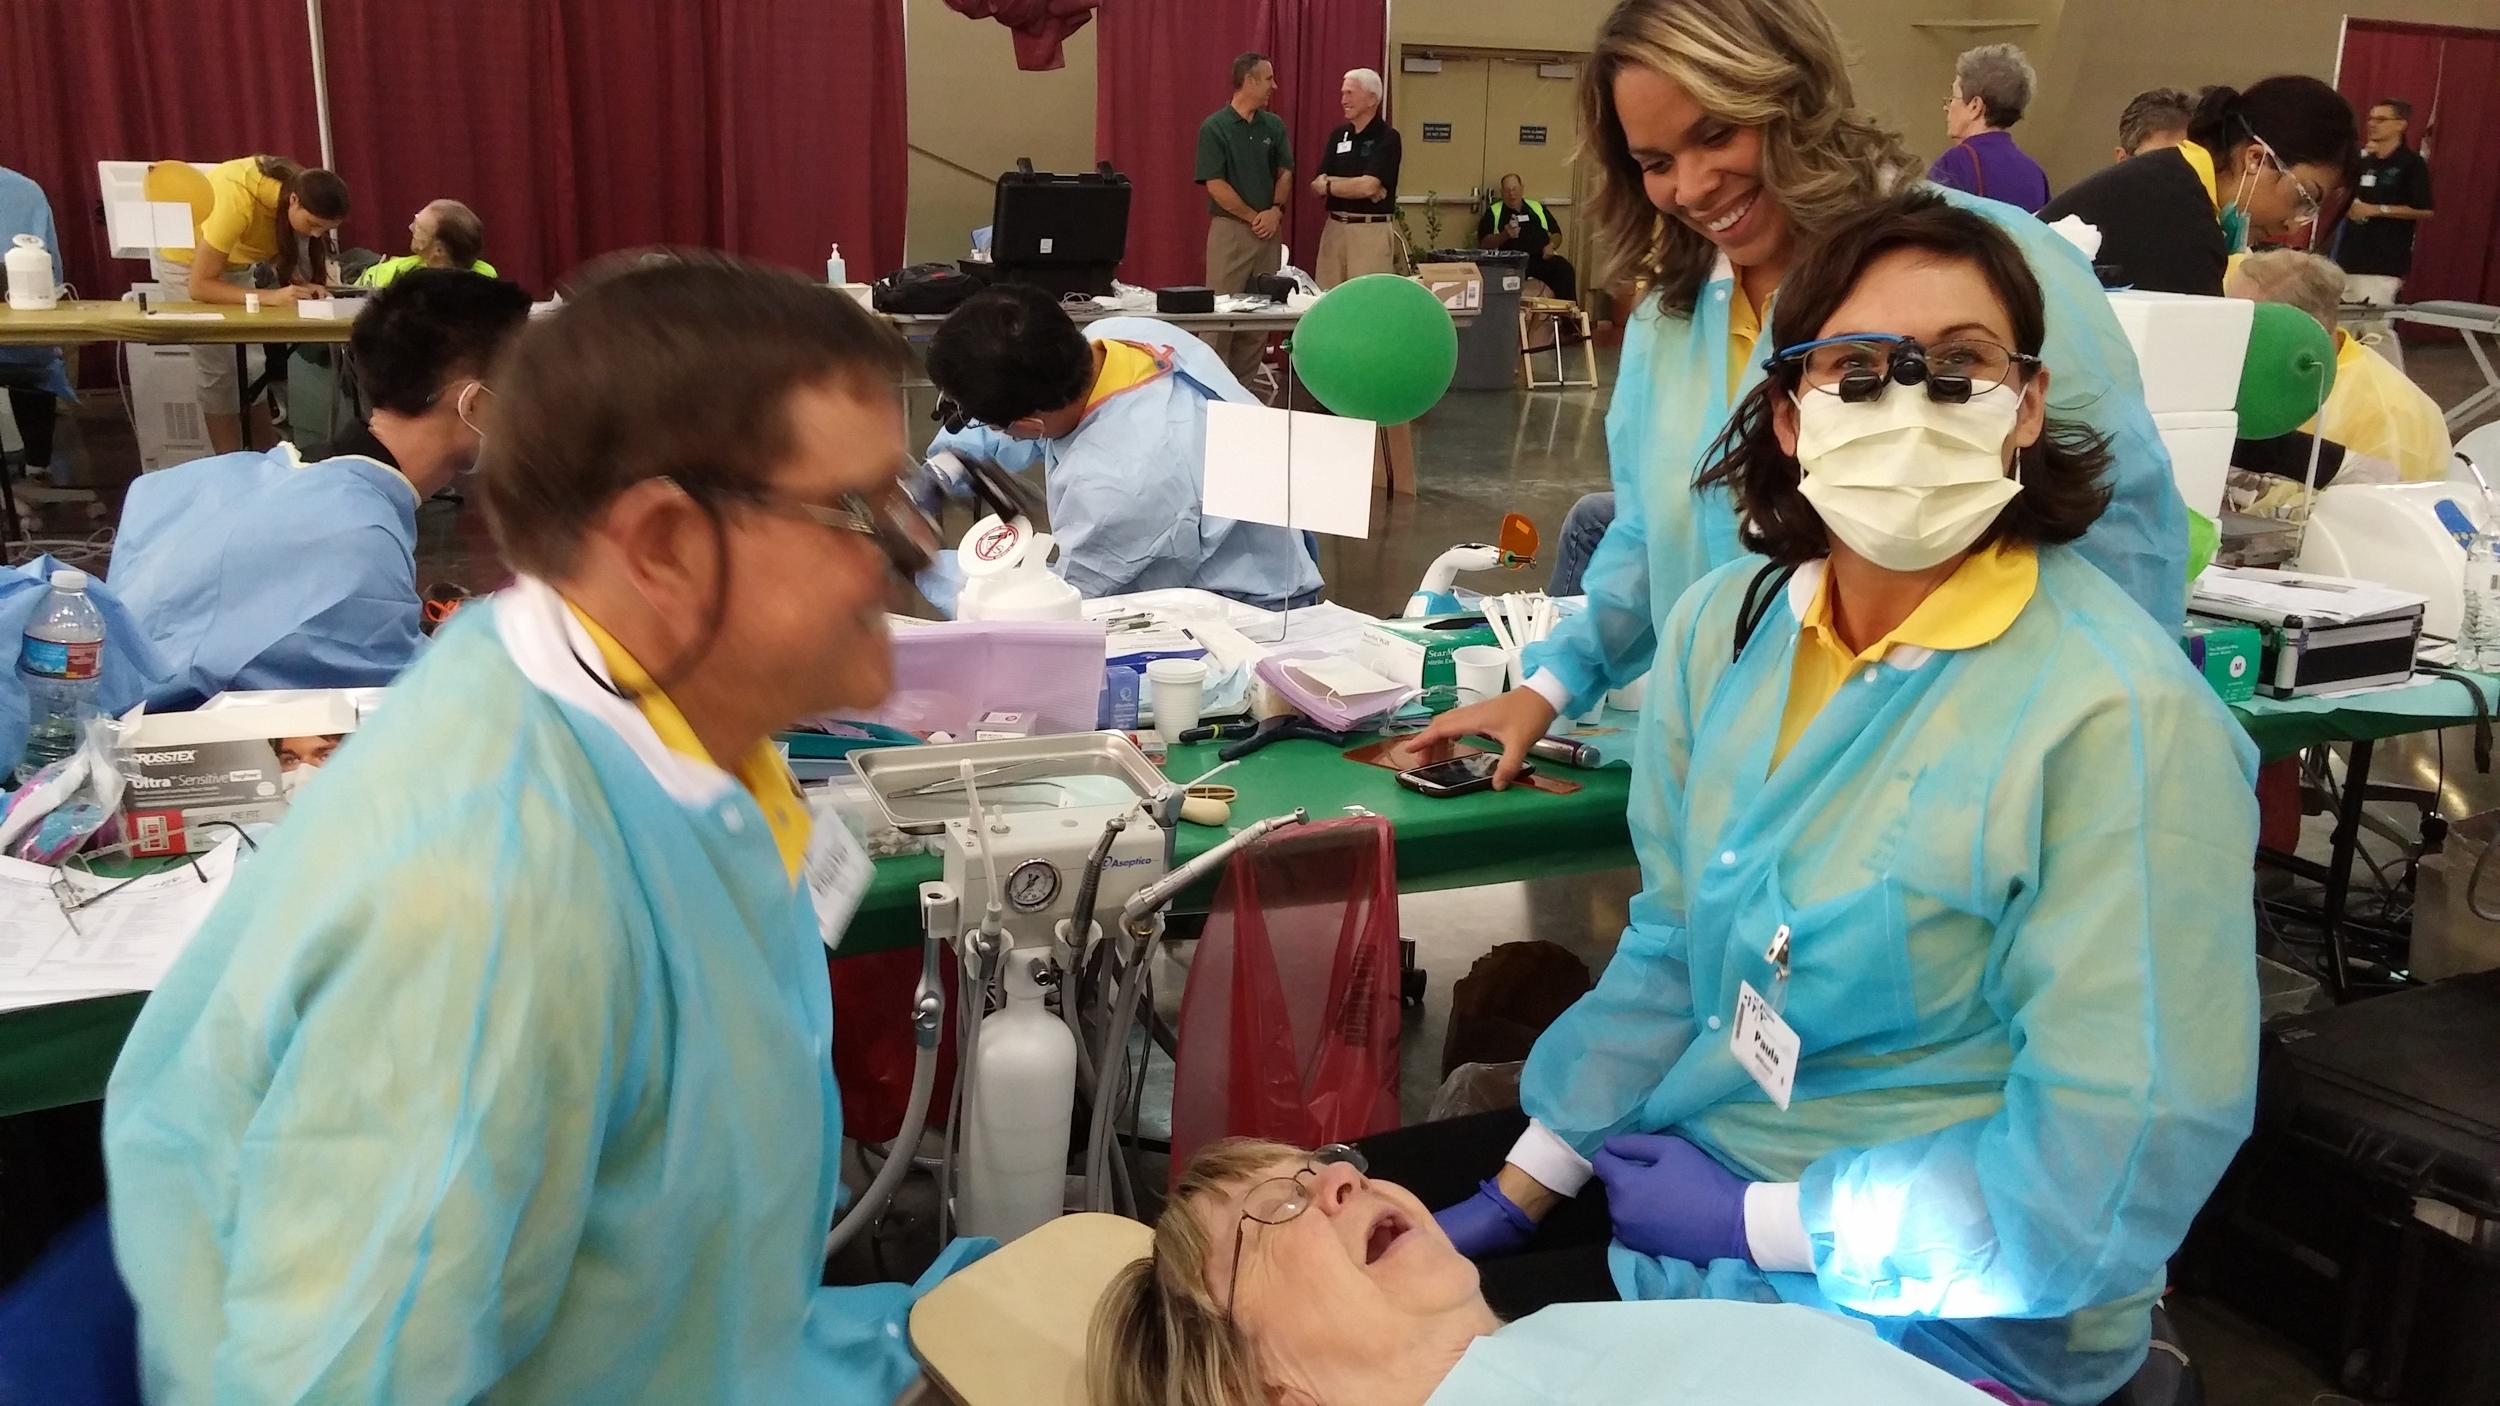 Volunteer dentist and dental assistant provide careatPathwayto Health 2015.